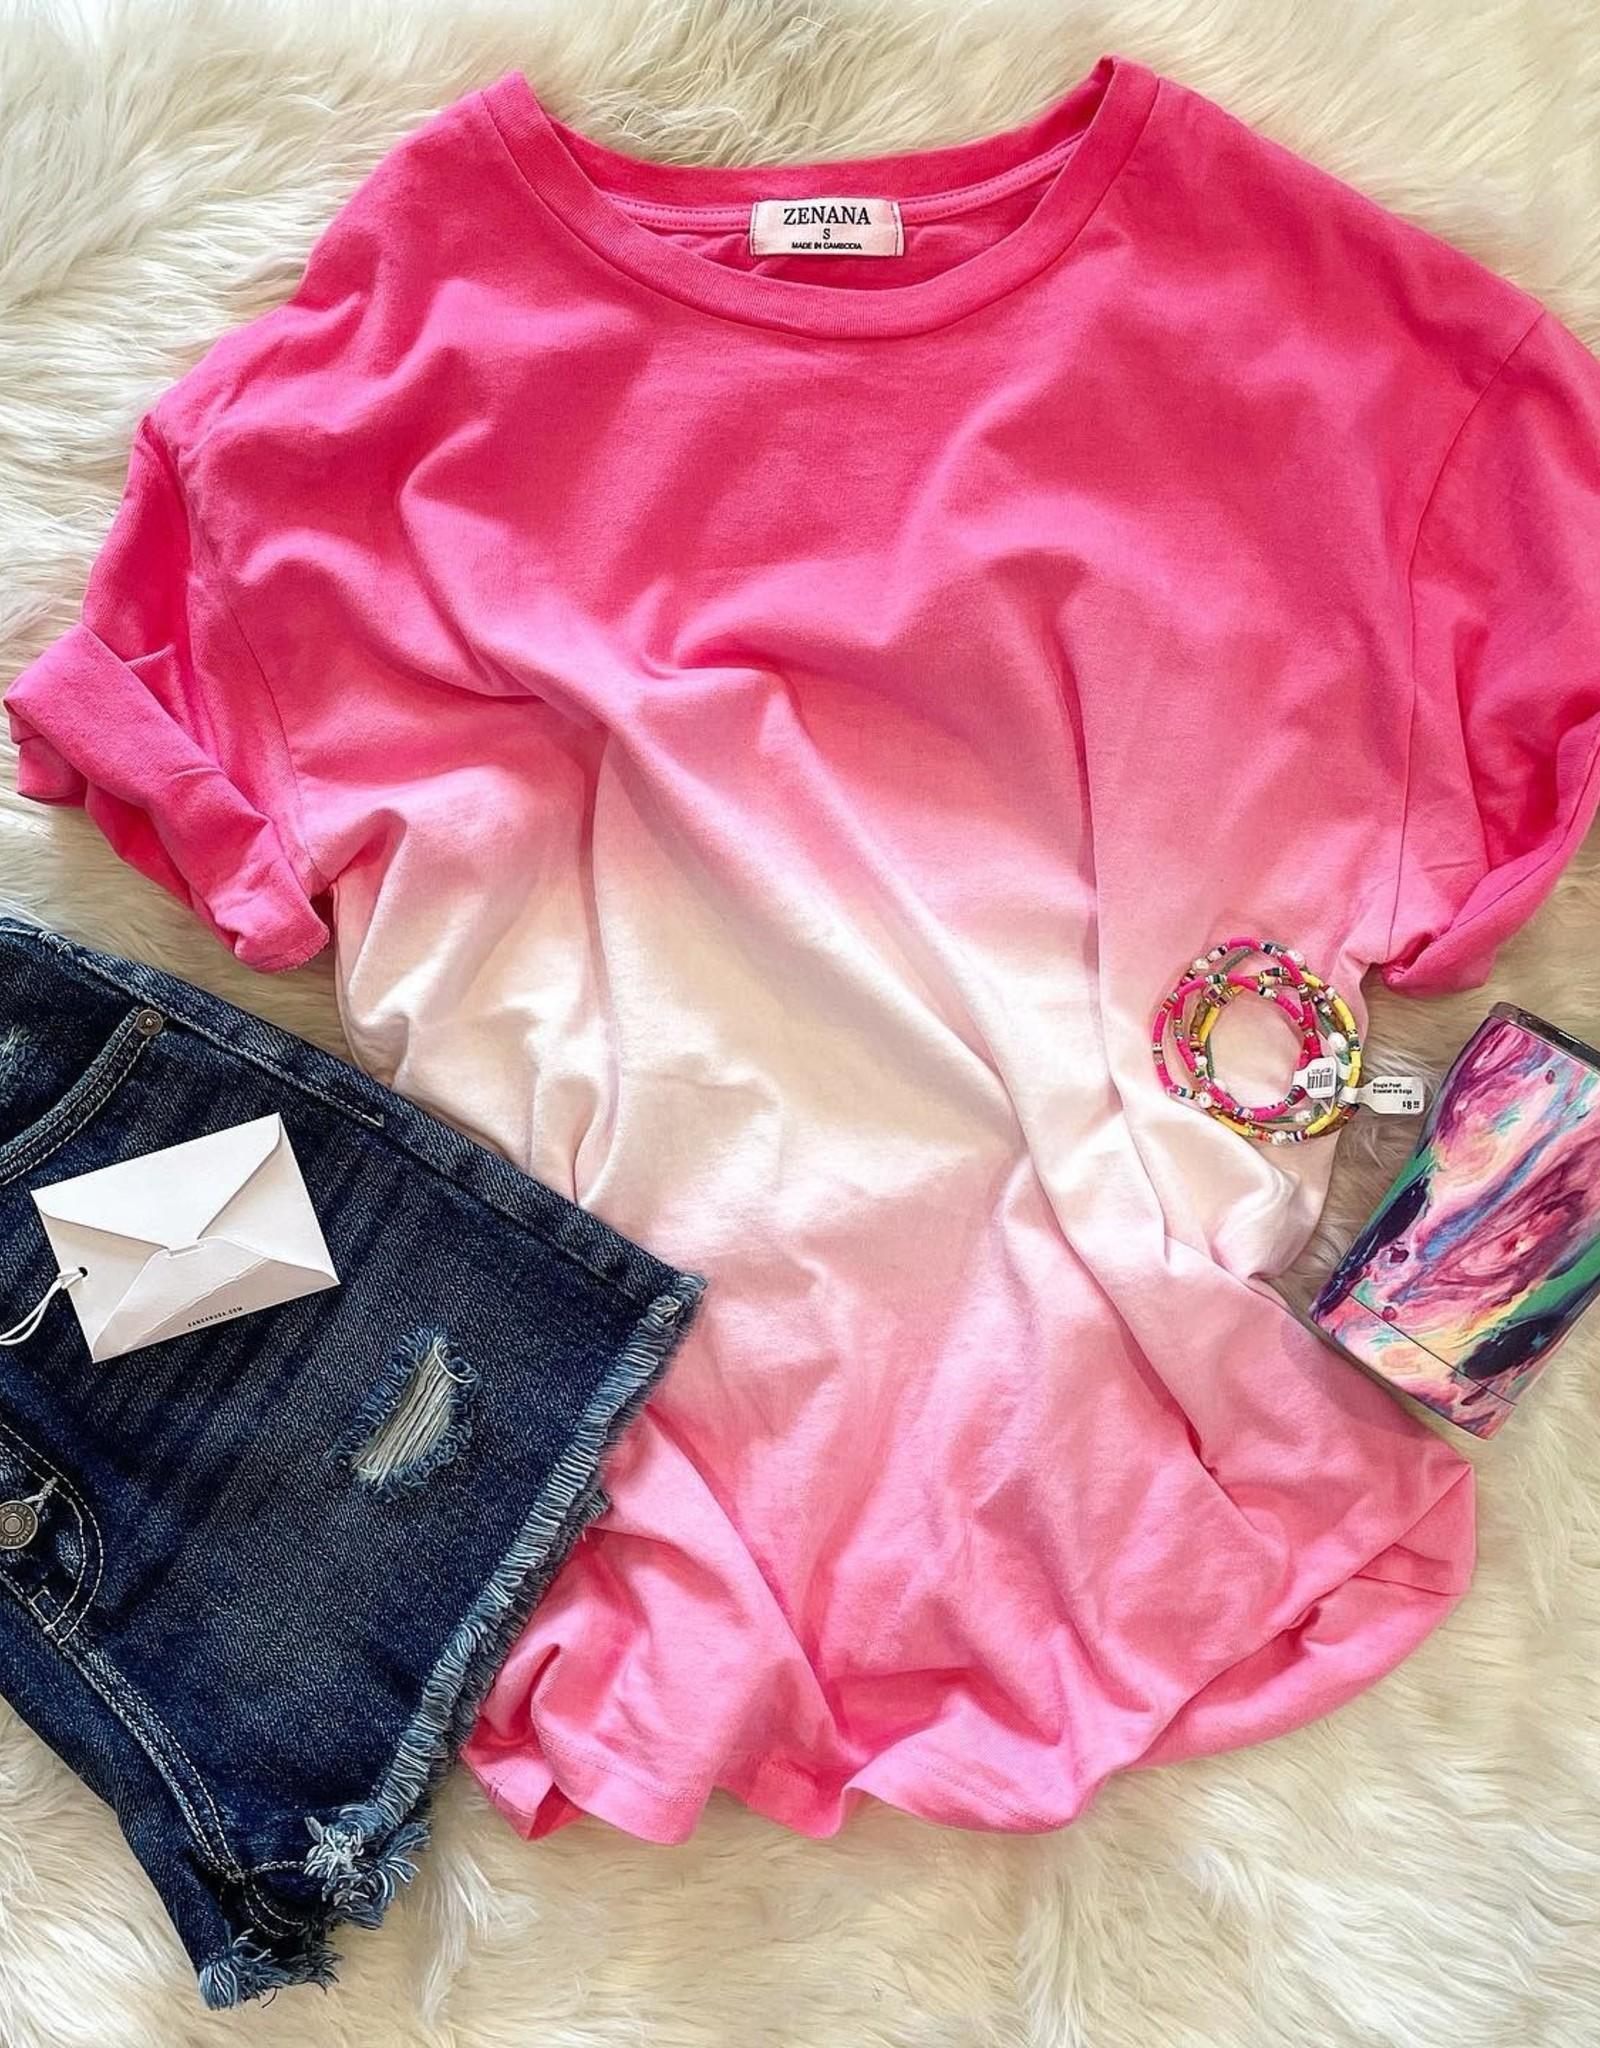 zenana Fallon Ombre Tee in Pink